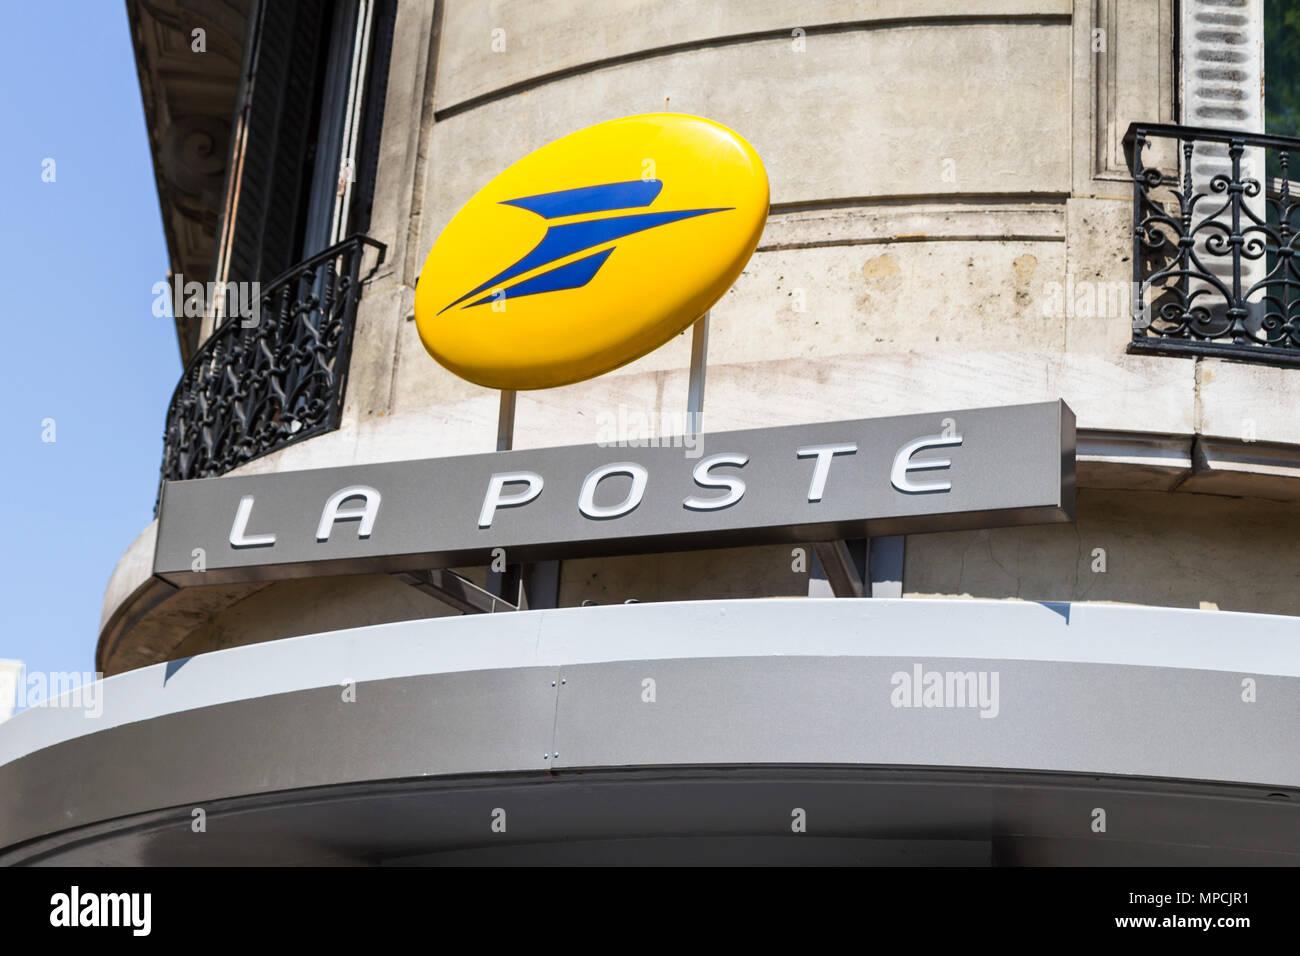 La Poste, french postal service outside retail sign - Stock Image